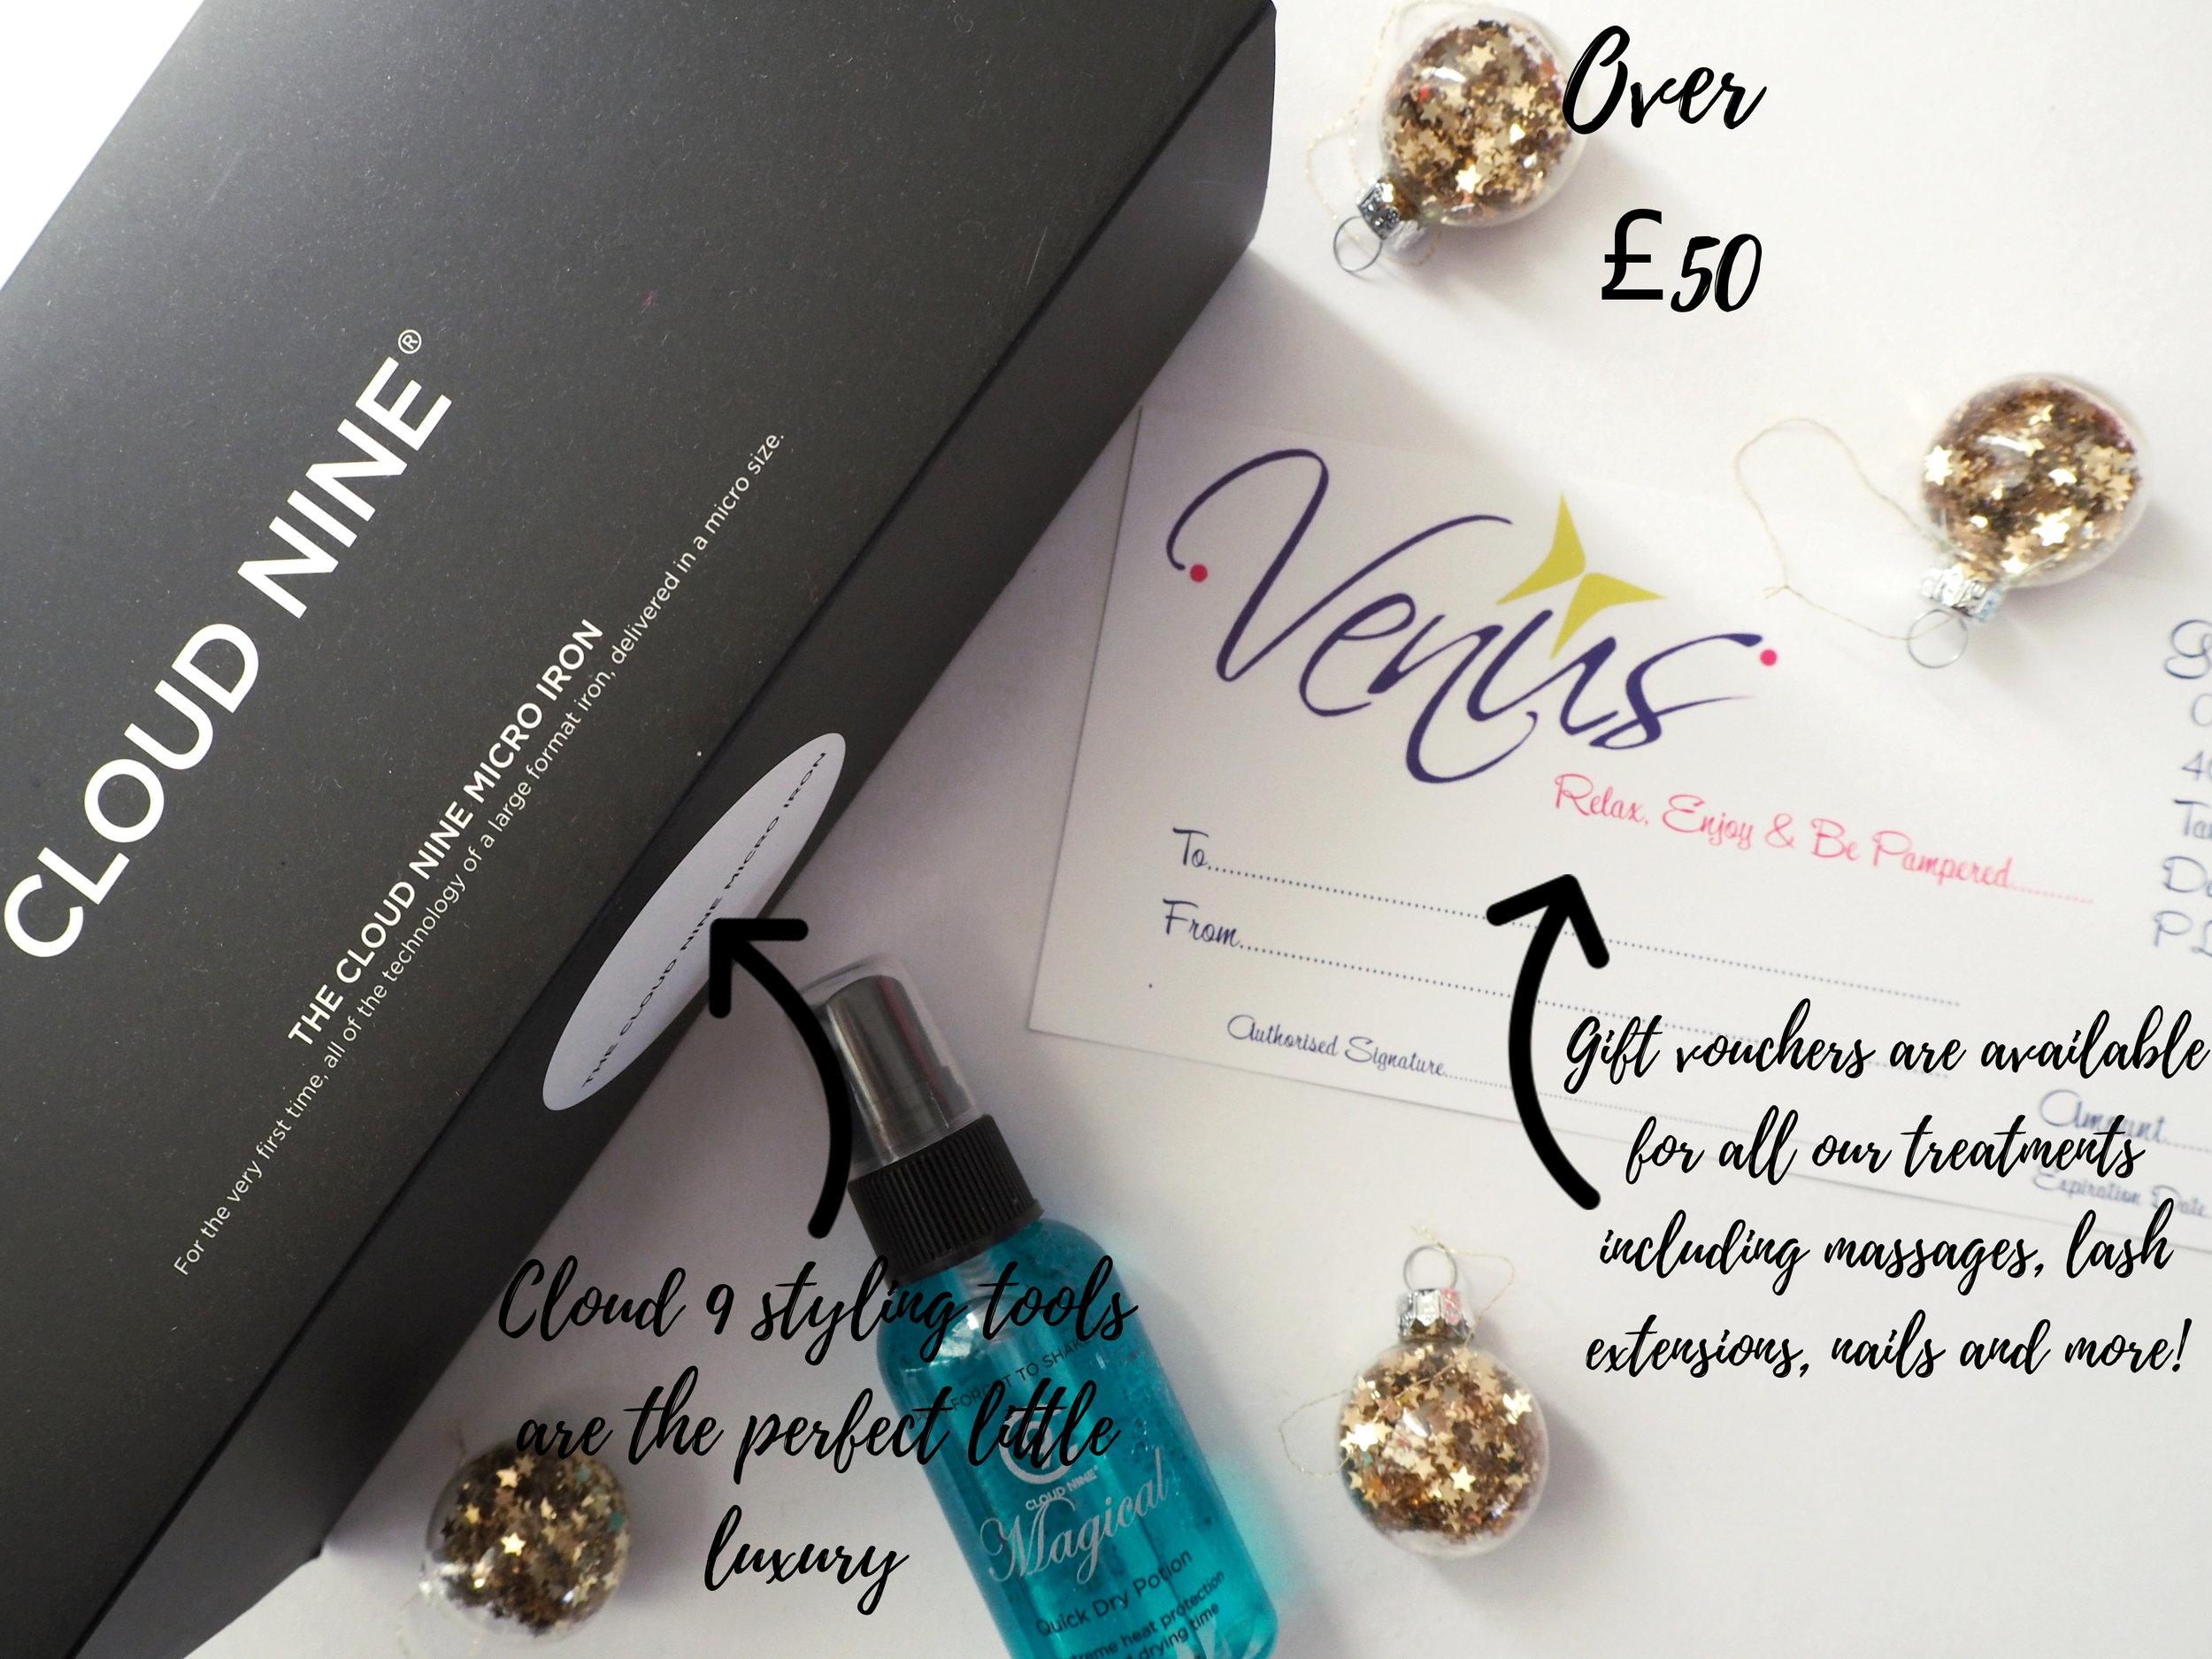 Venus-Beauty-Hair-Tavistock-Devon-Salon-Christmas-Gift-Guide-Cloud-9-Gift-Voucher-Lash-Extensions-Massages-Over-50.JPG